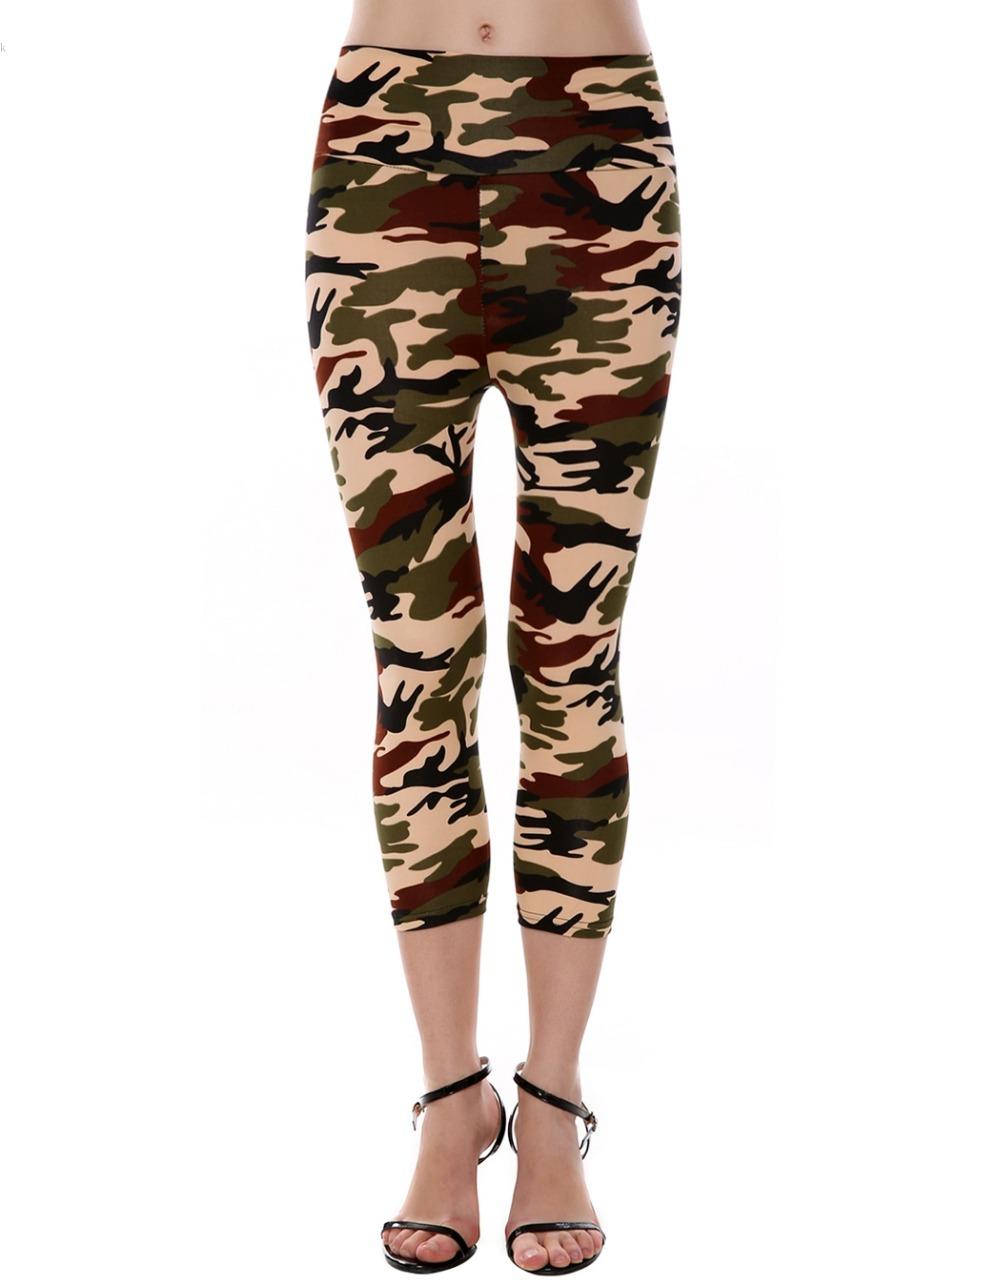 2016 Women Sexy Sport Camouflage Leggings Stretchy Slim Army Camo Leggings Female Fitness ...